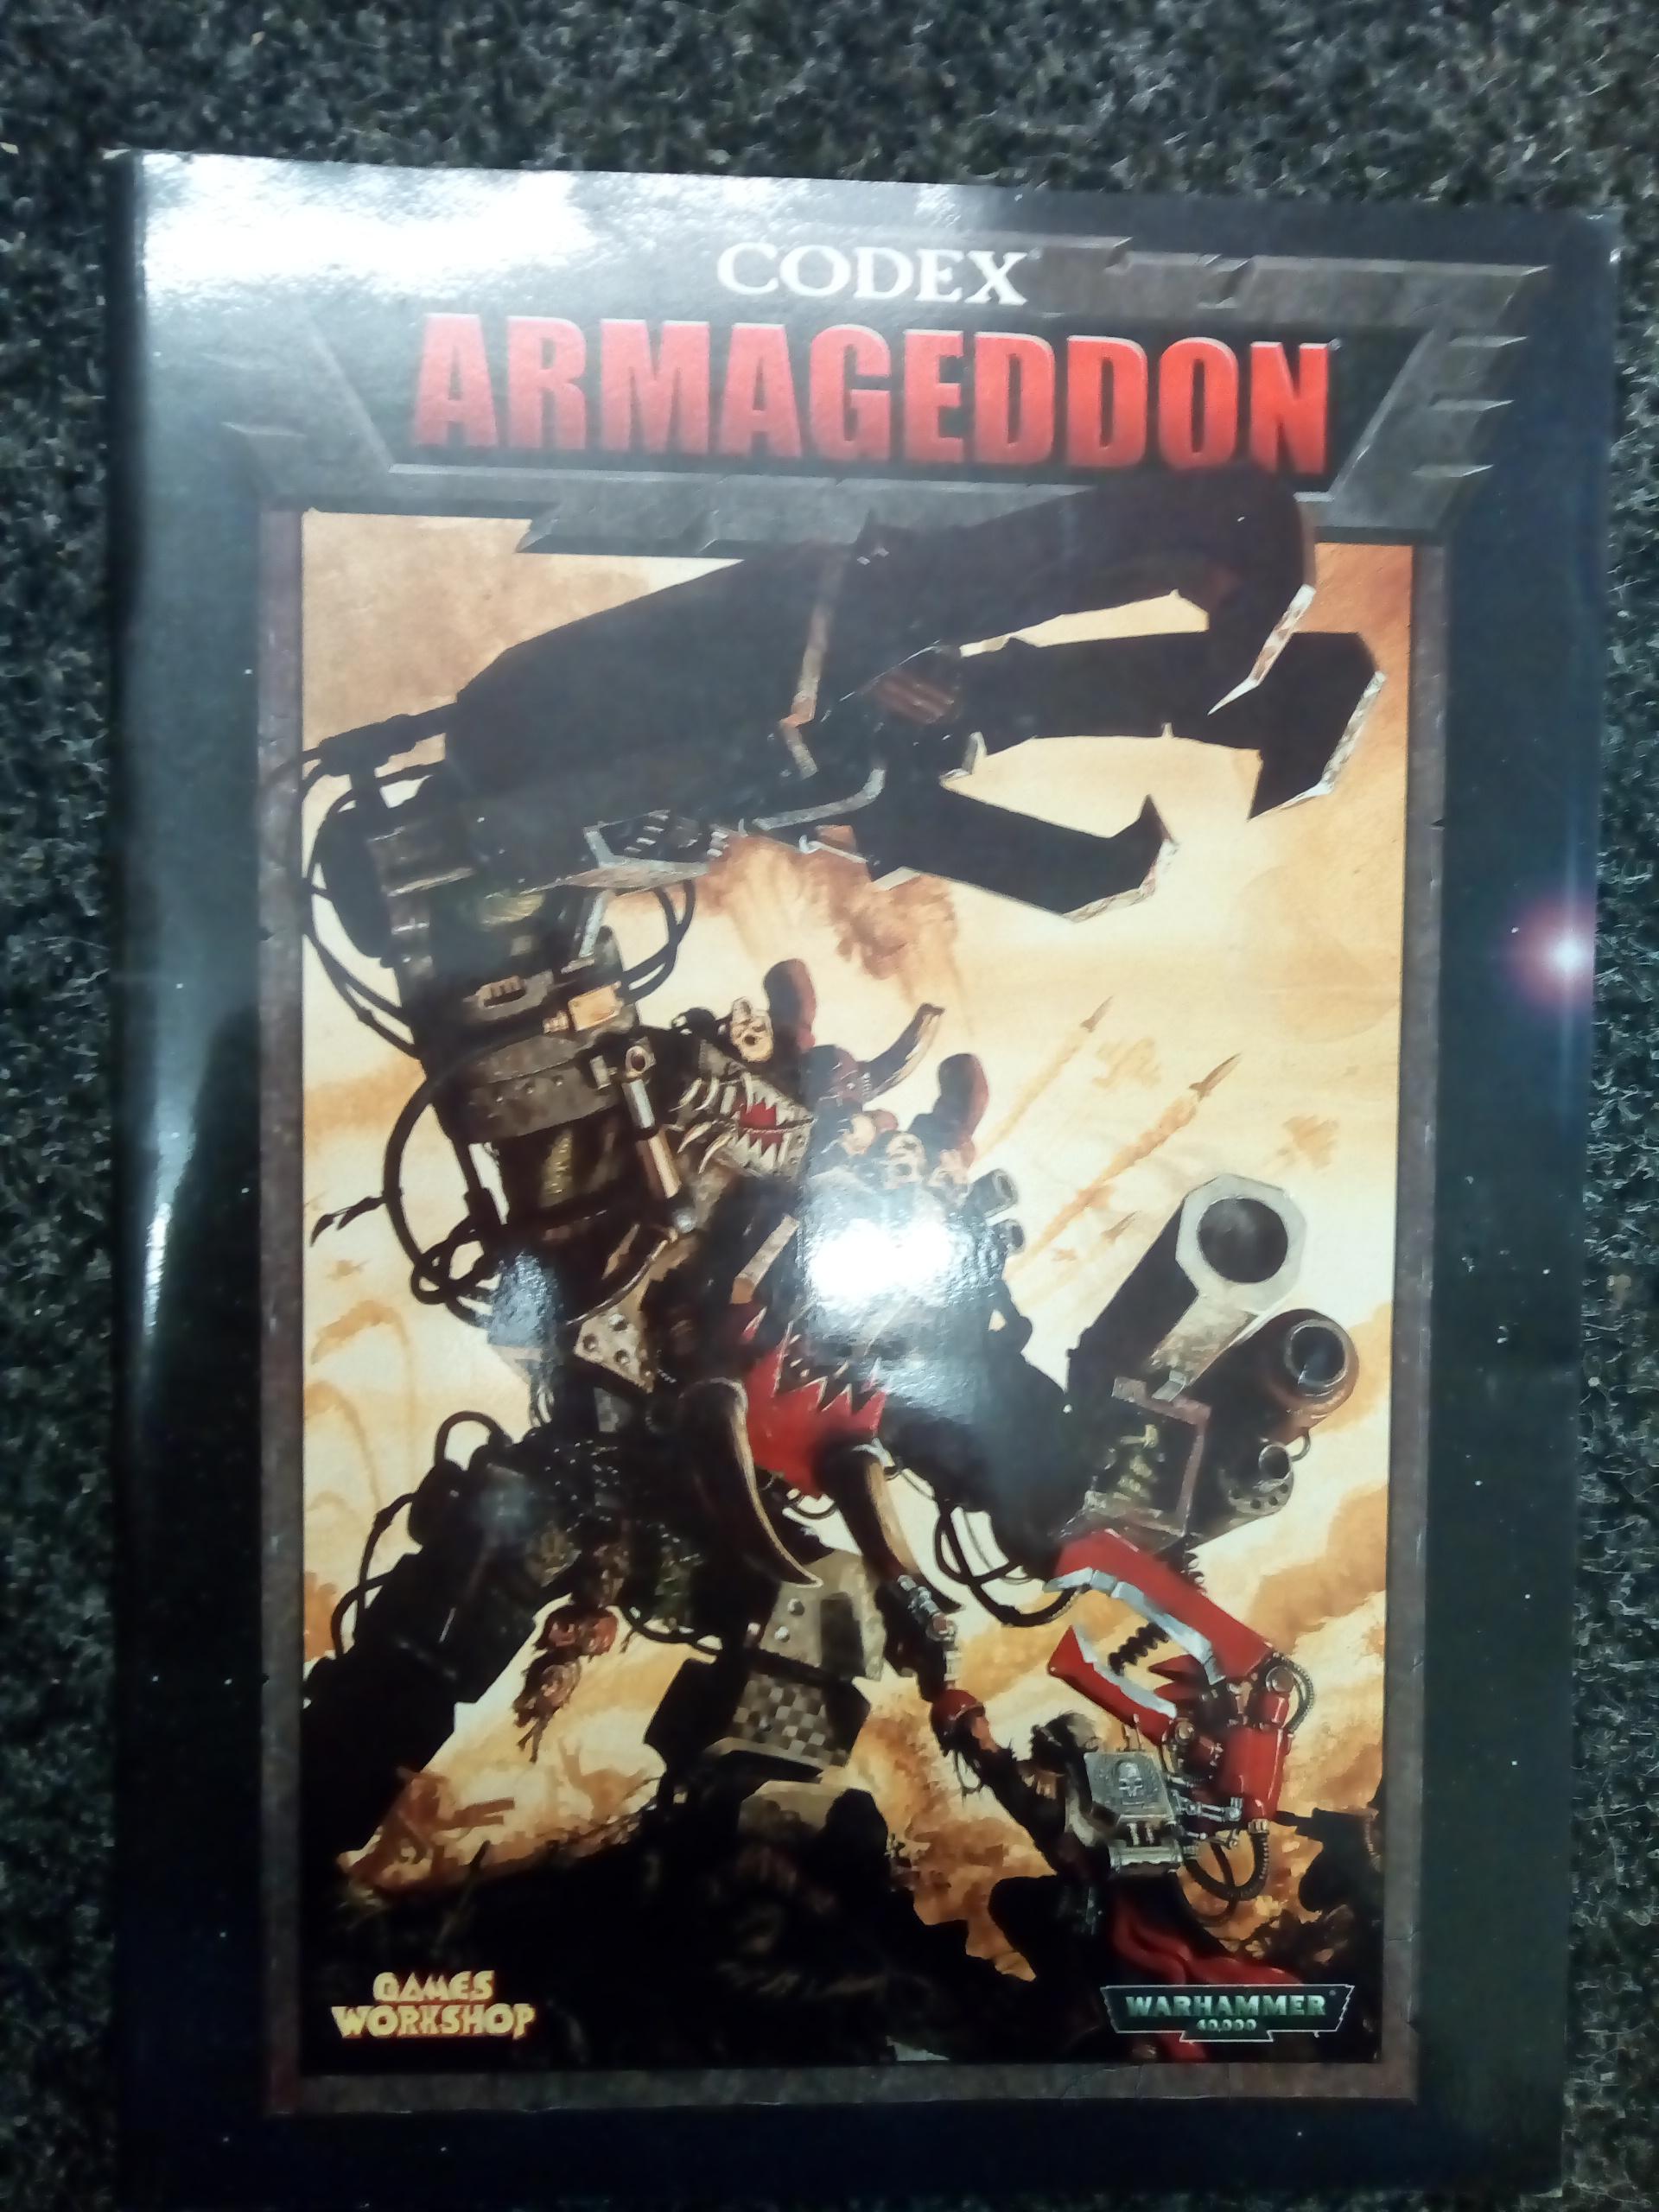 Warhammer 40K 3rd Edition Armageddon Codex